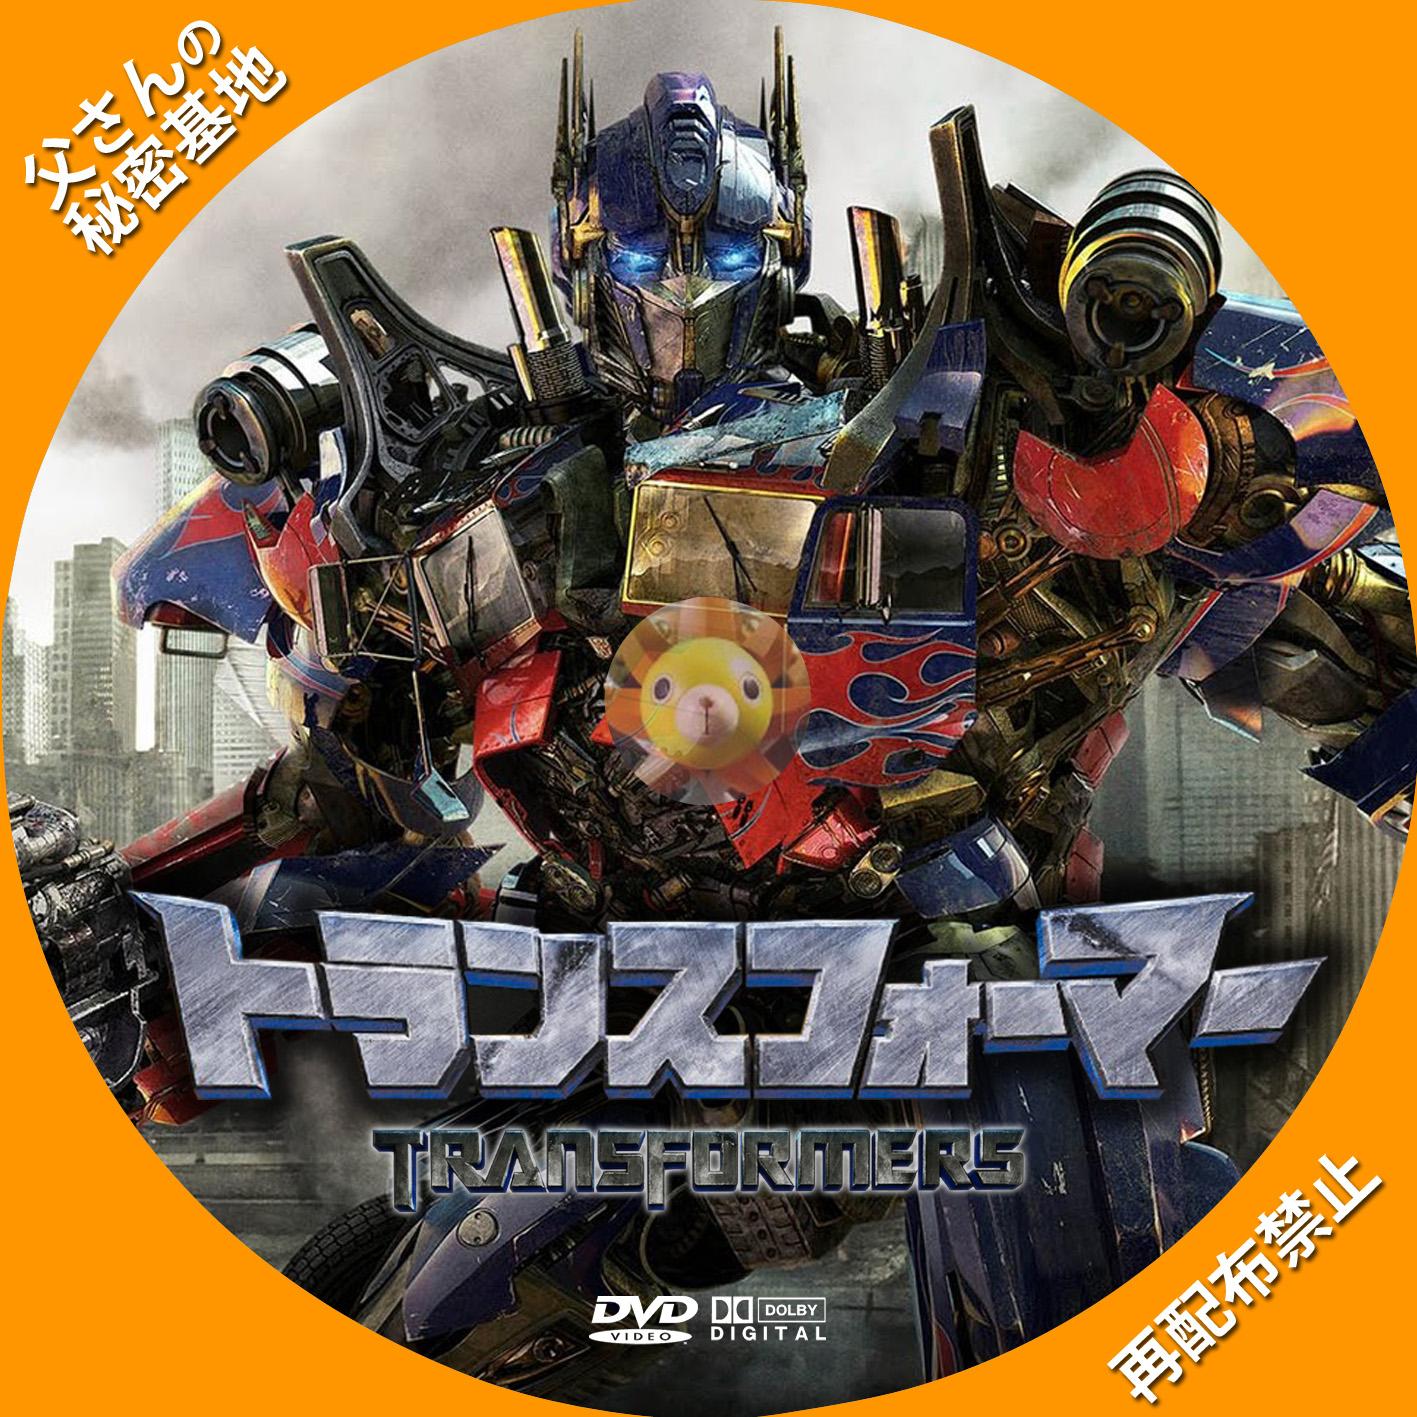 transformers_DVD_02.jpg